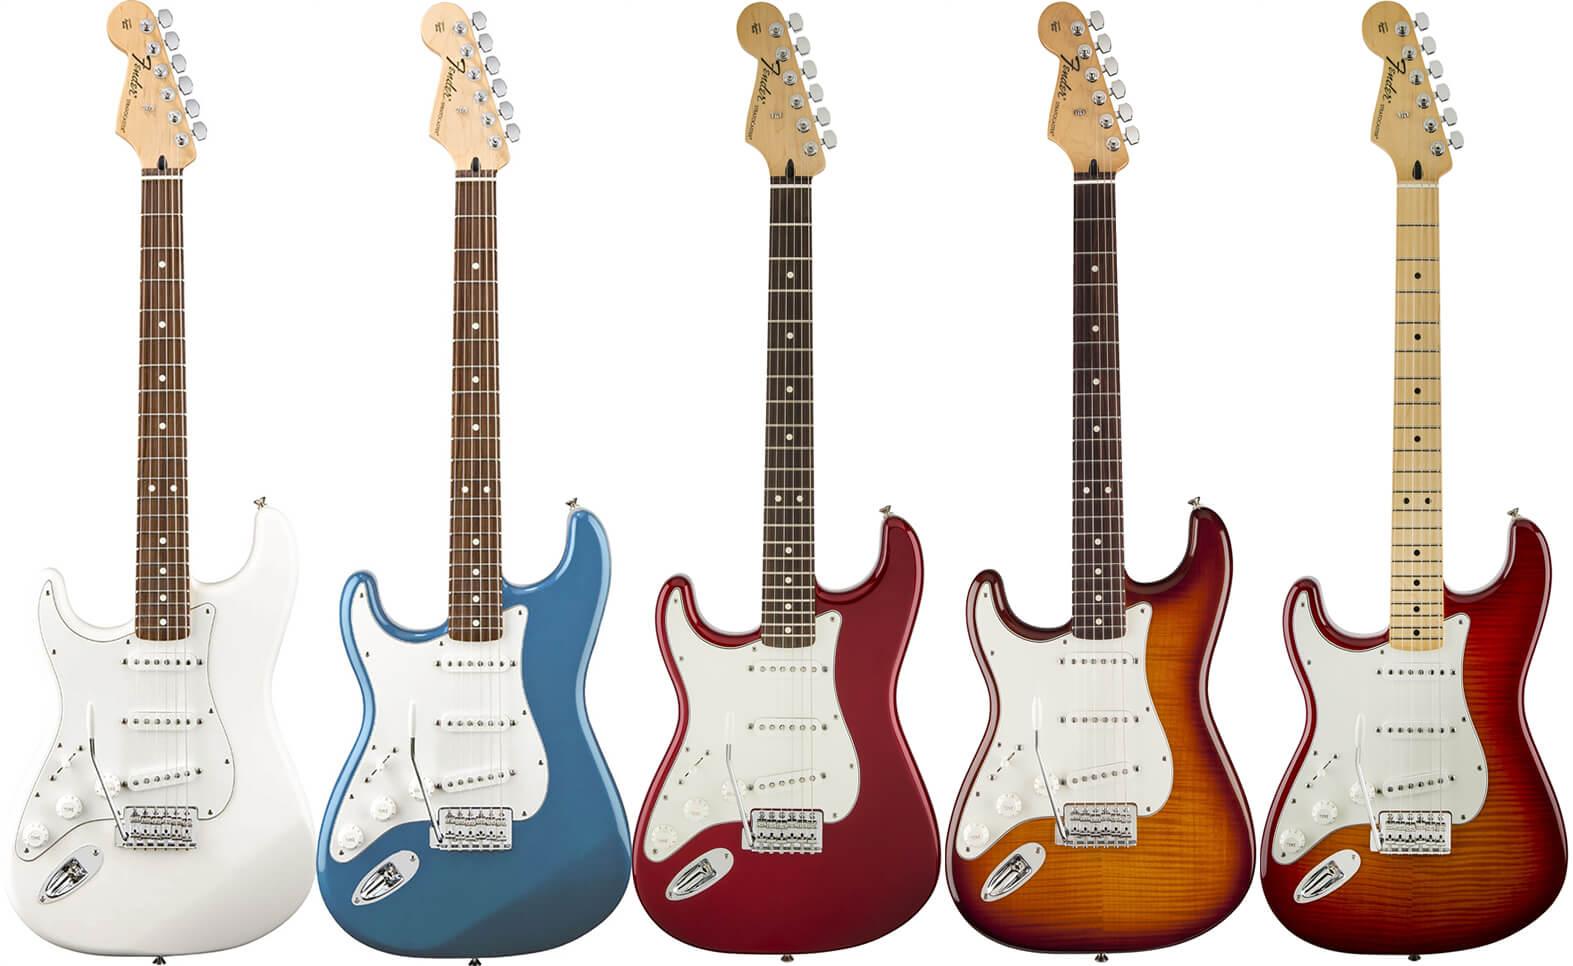 Standard Stratocaster Left-Hand